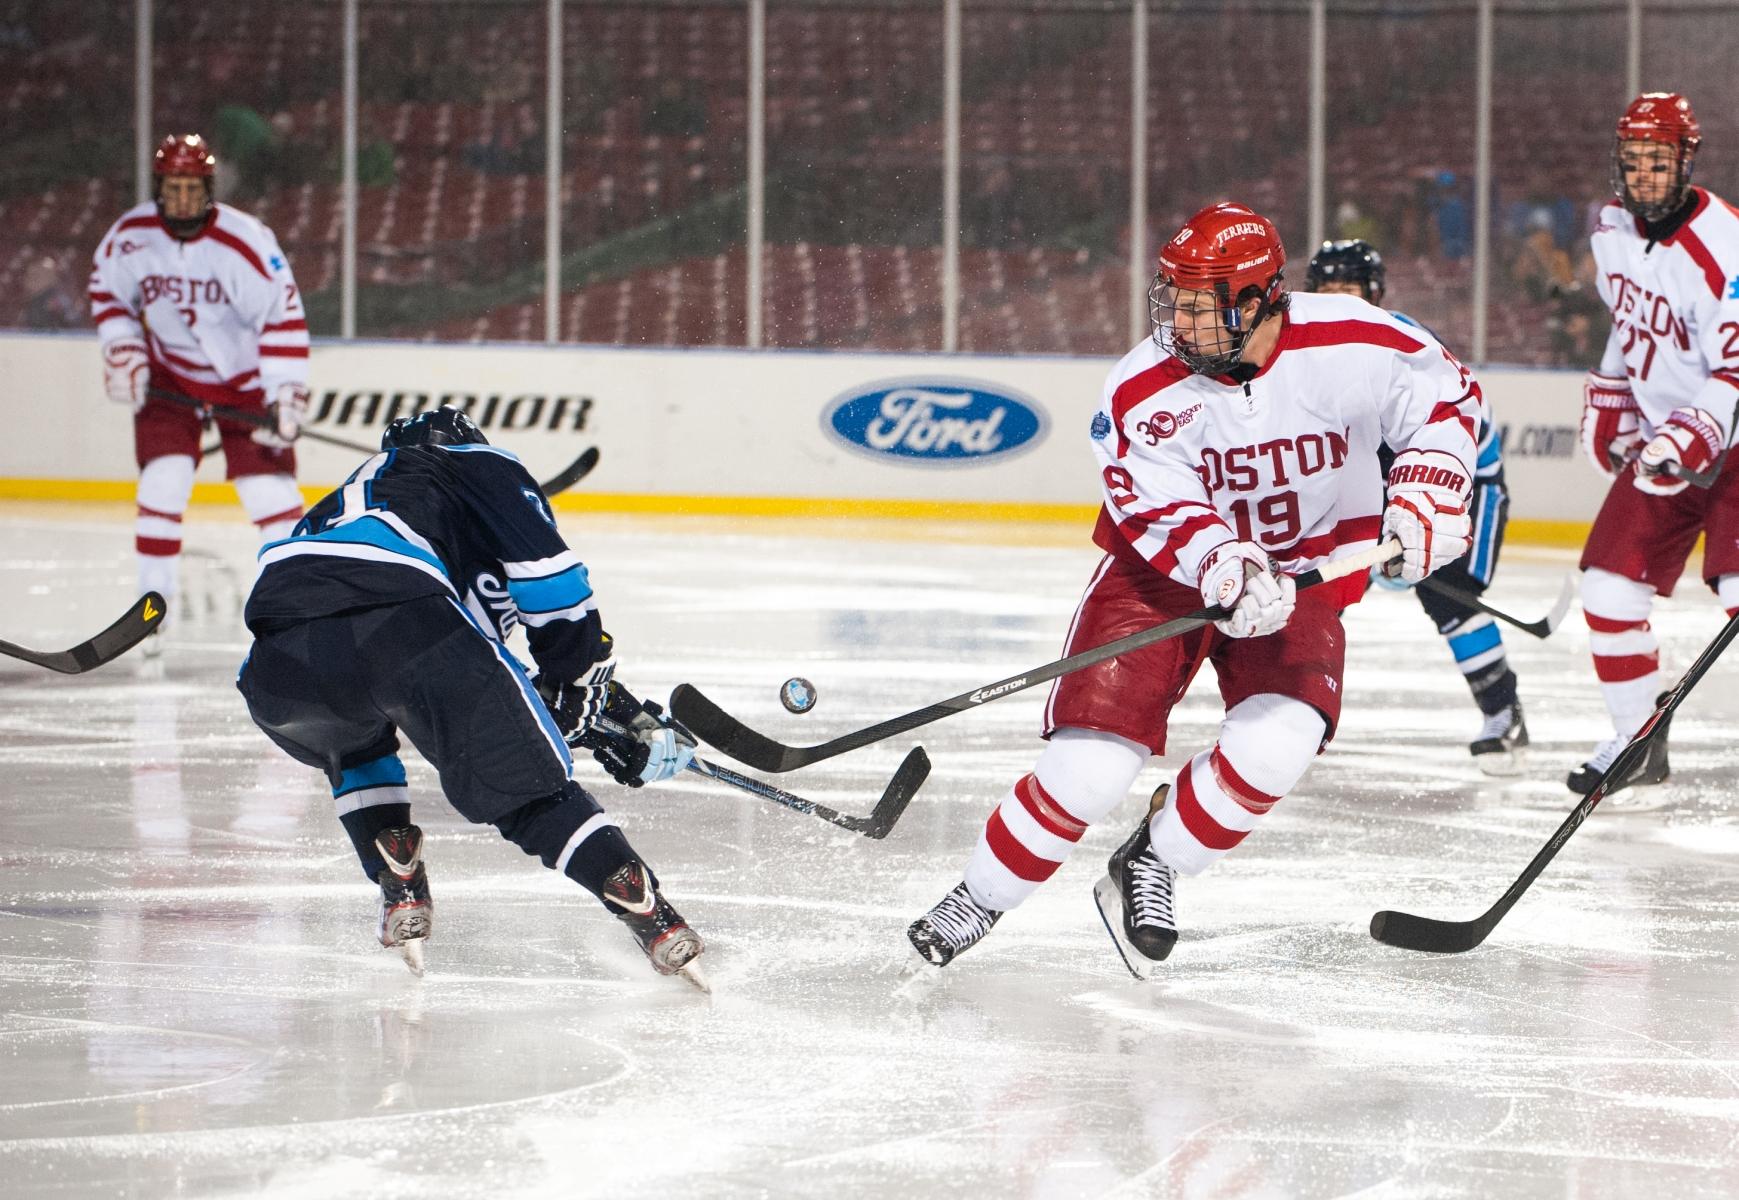 Sport: Hockey